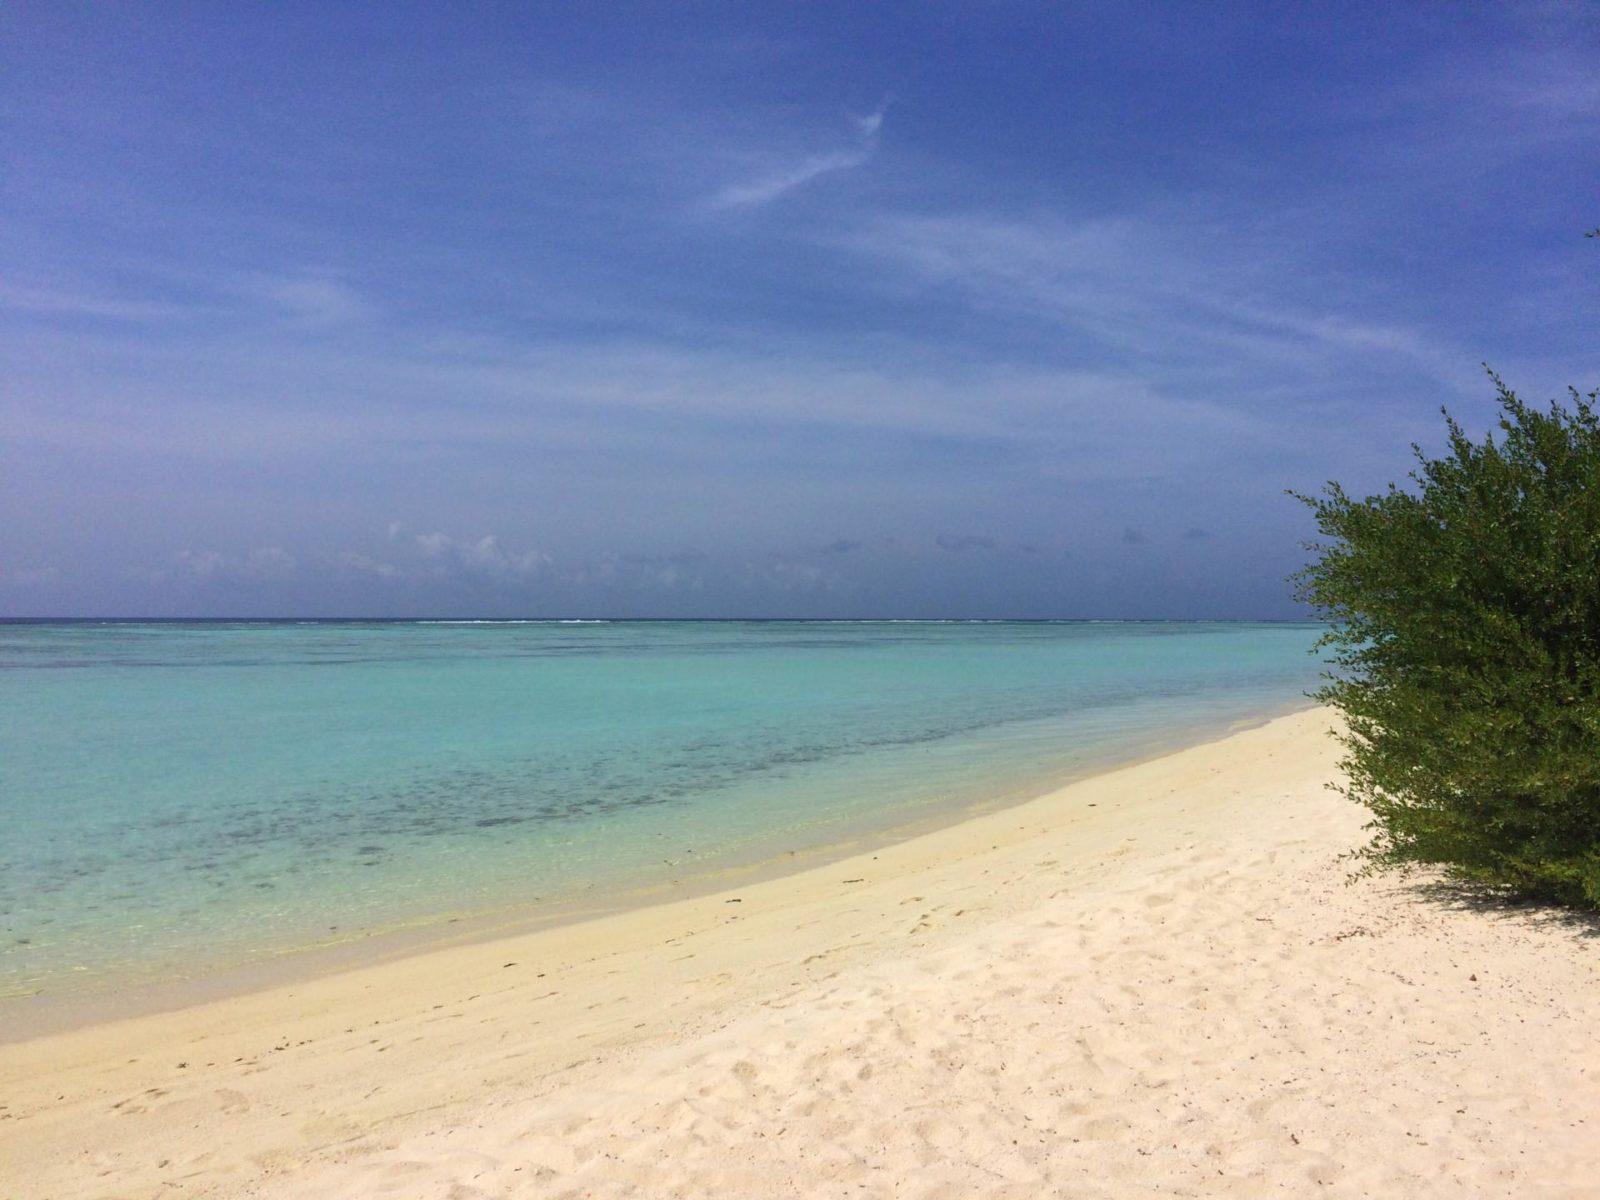 white sand beach turquoise sea blue skies the maldives